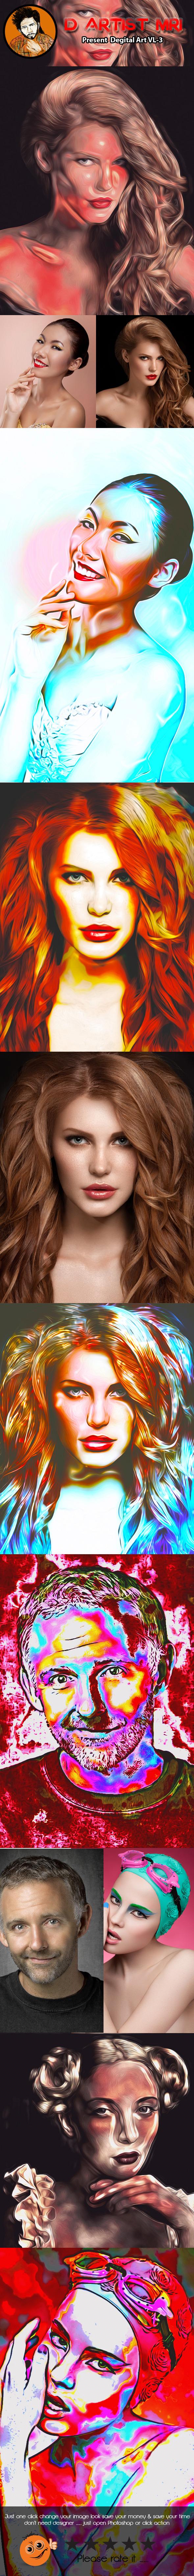 Degital Art VL-3 - Actions Photoshop